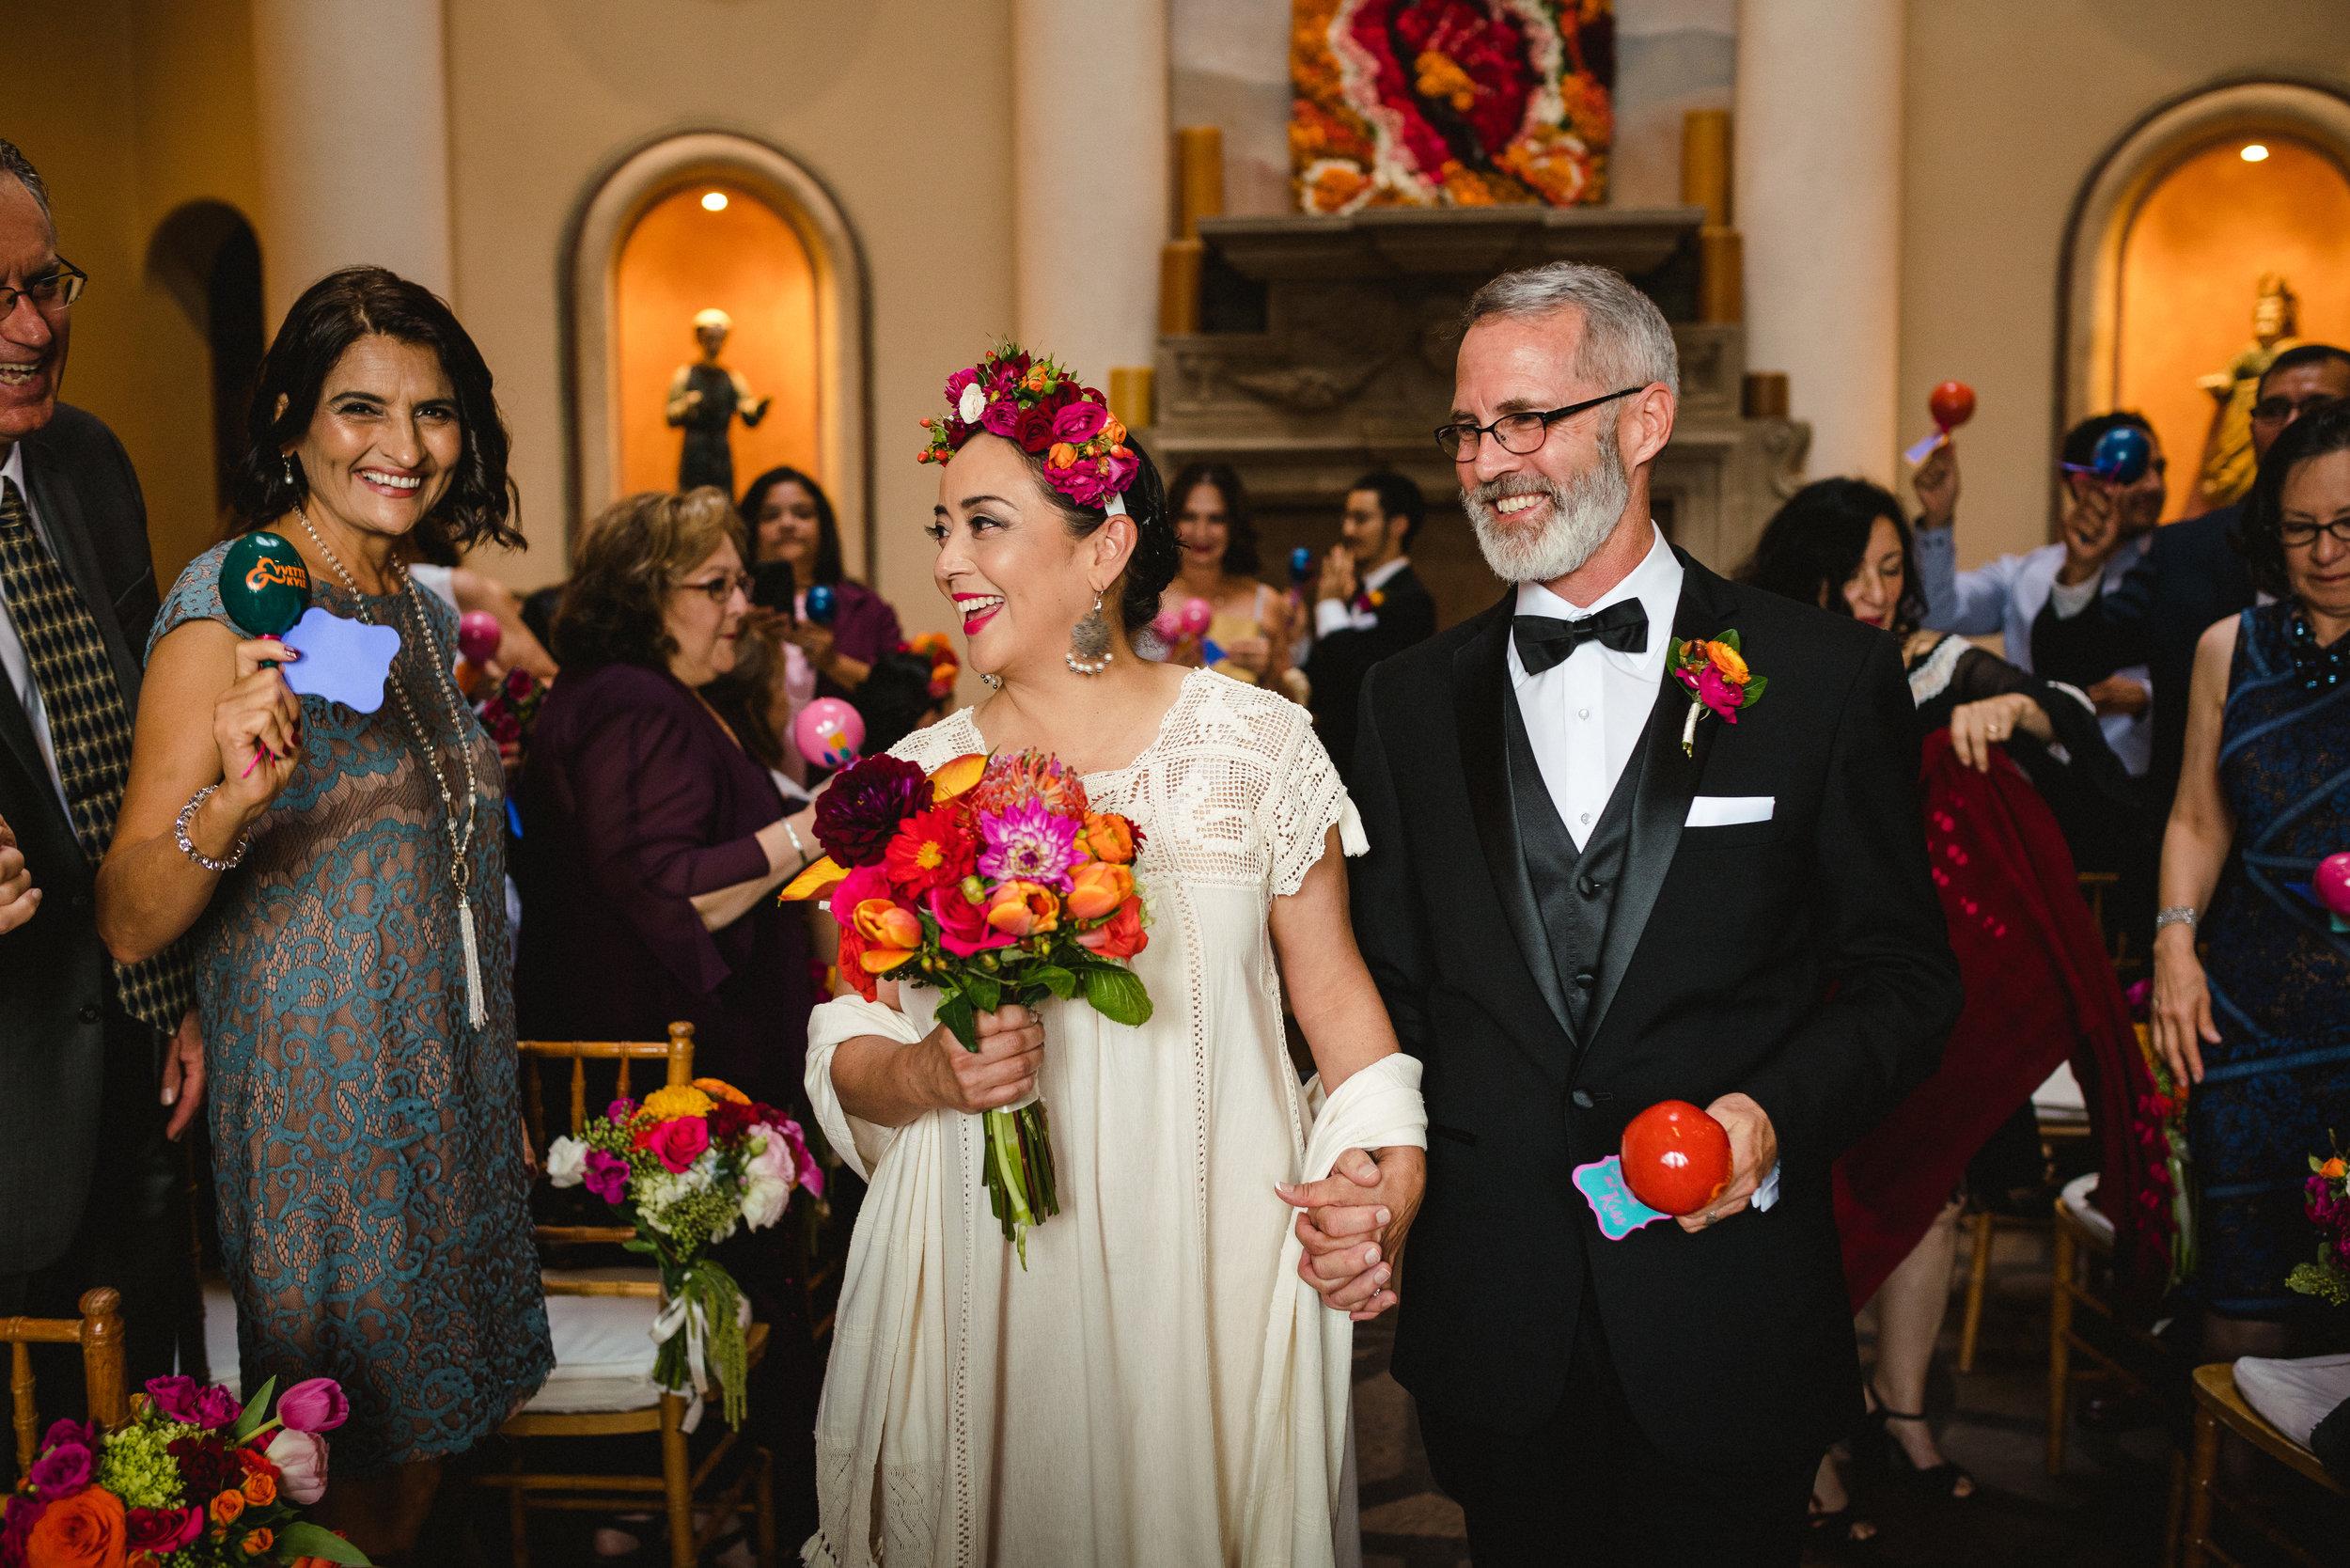 MaurizioSolisBroca-casa-carino-san-miguel-de-allende-wedding-68.jpg